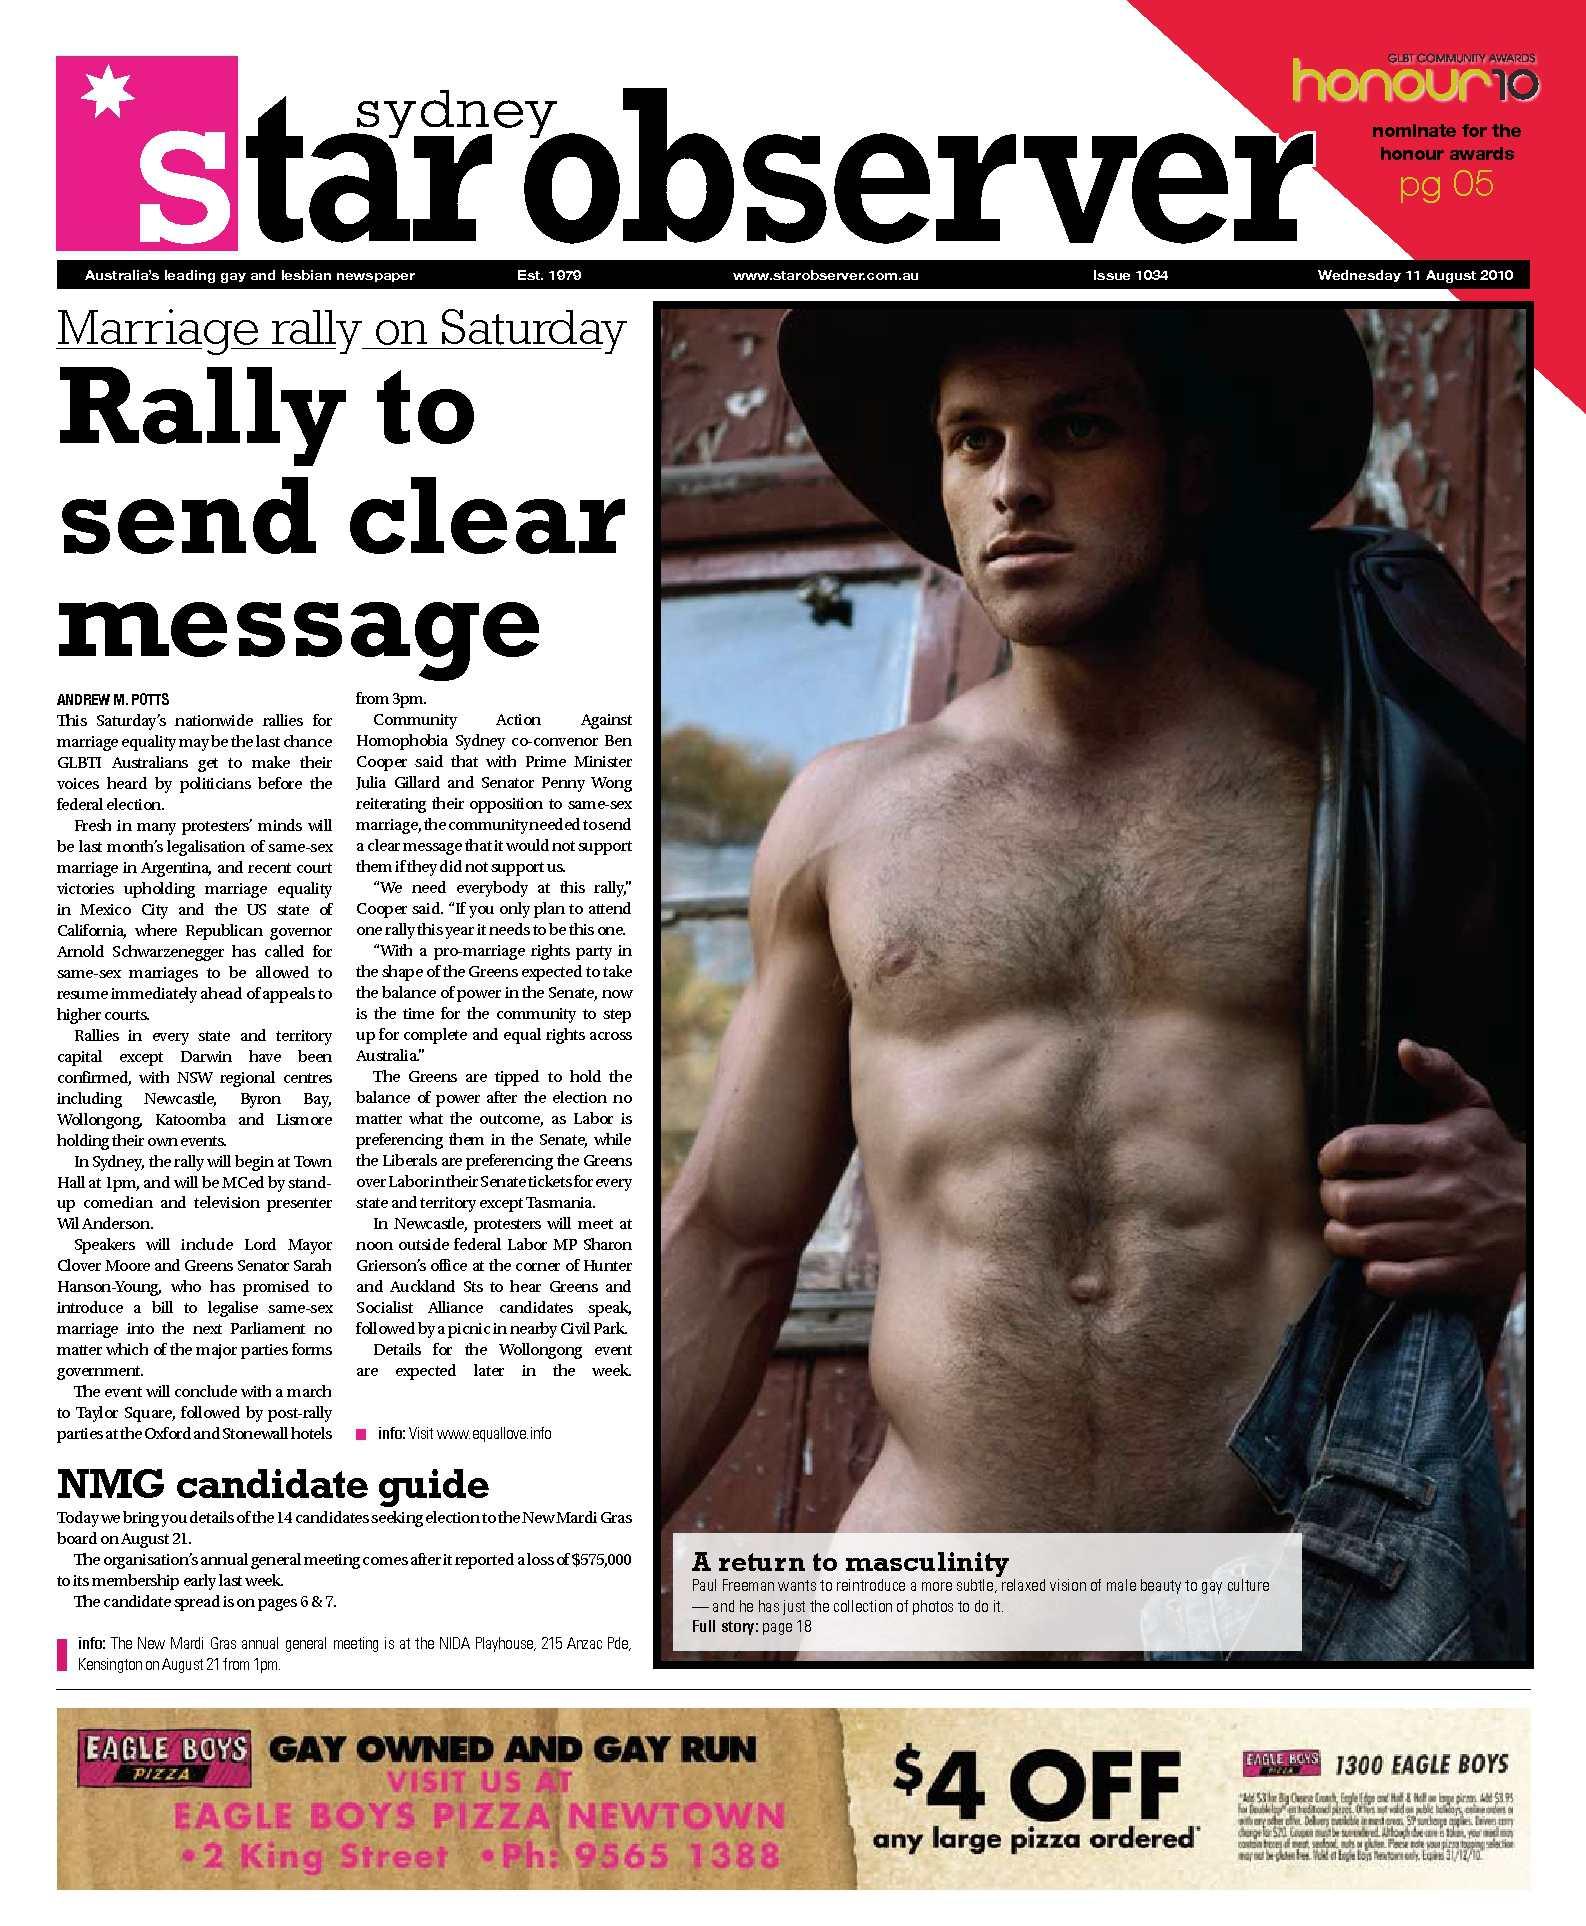 Sydney Star Observer issue 1034